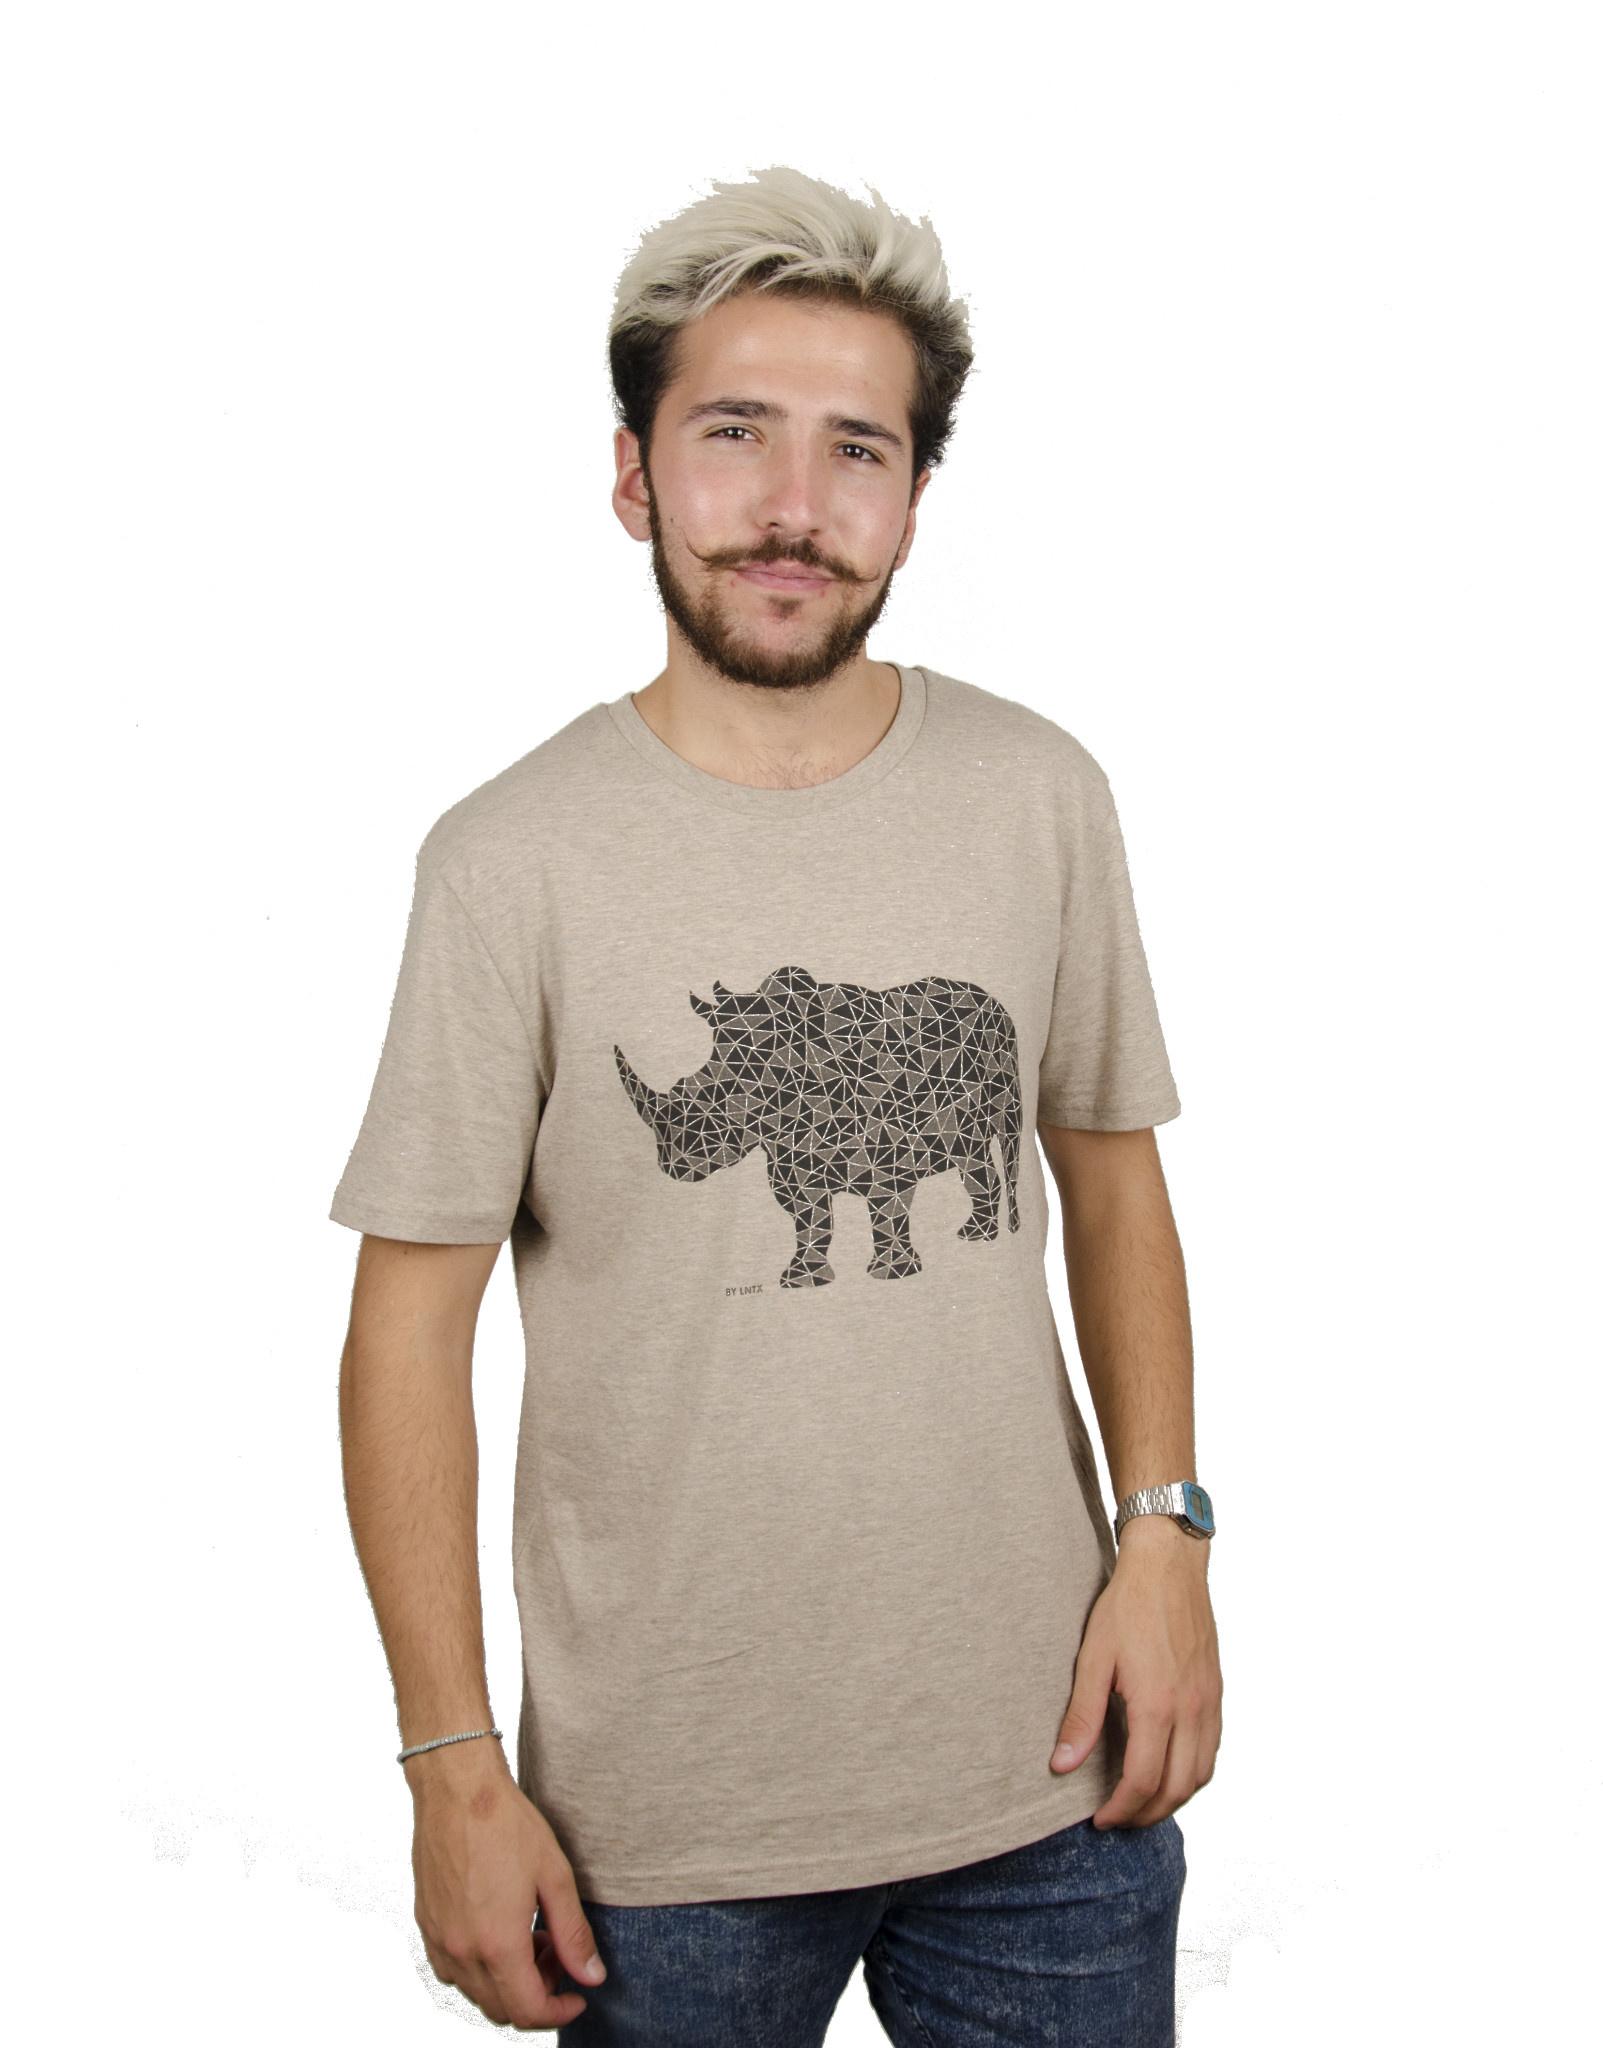 Neushoorn T-shirt